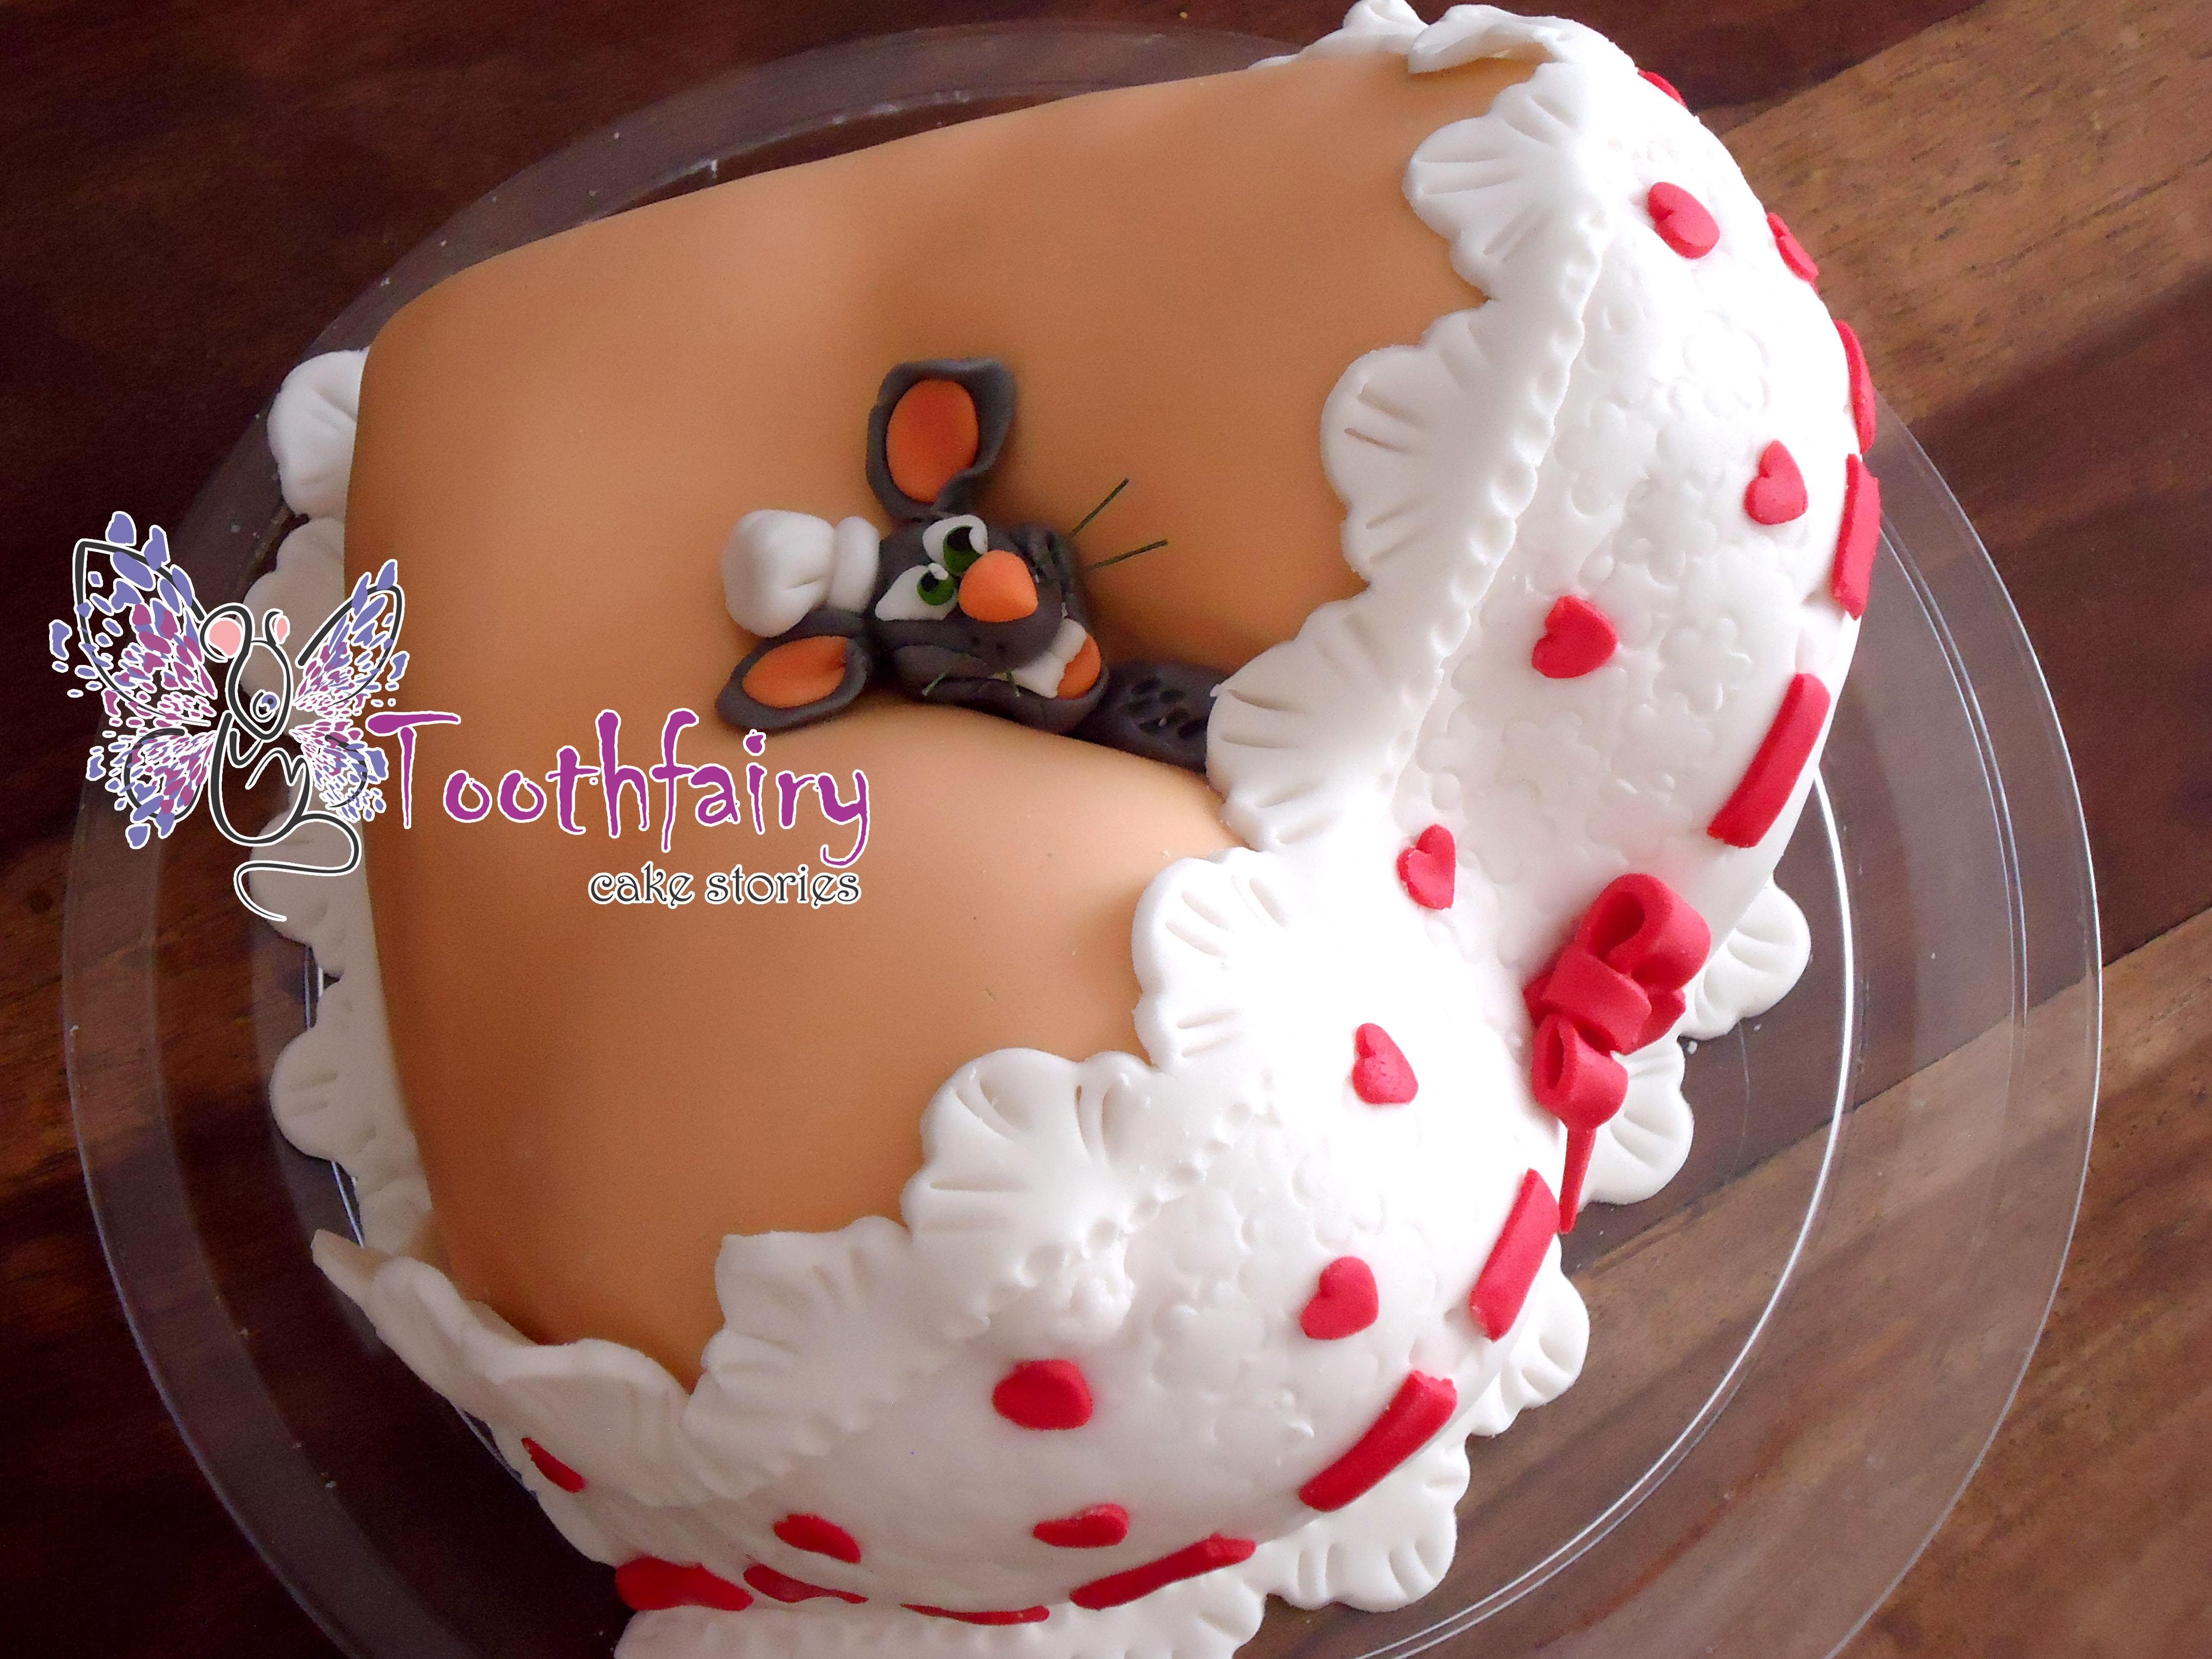 how to make a boob cake